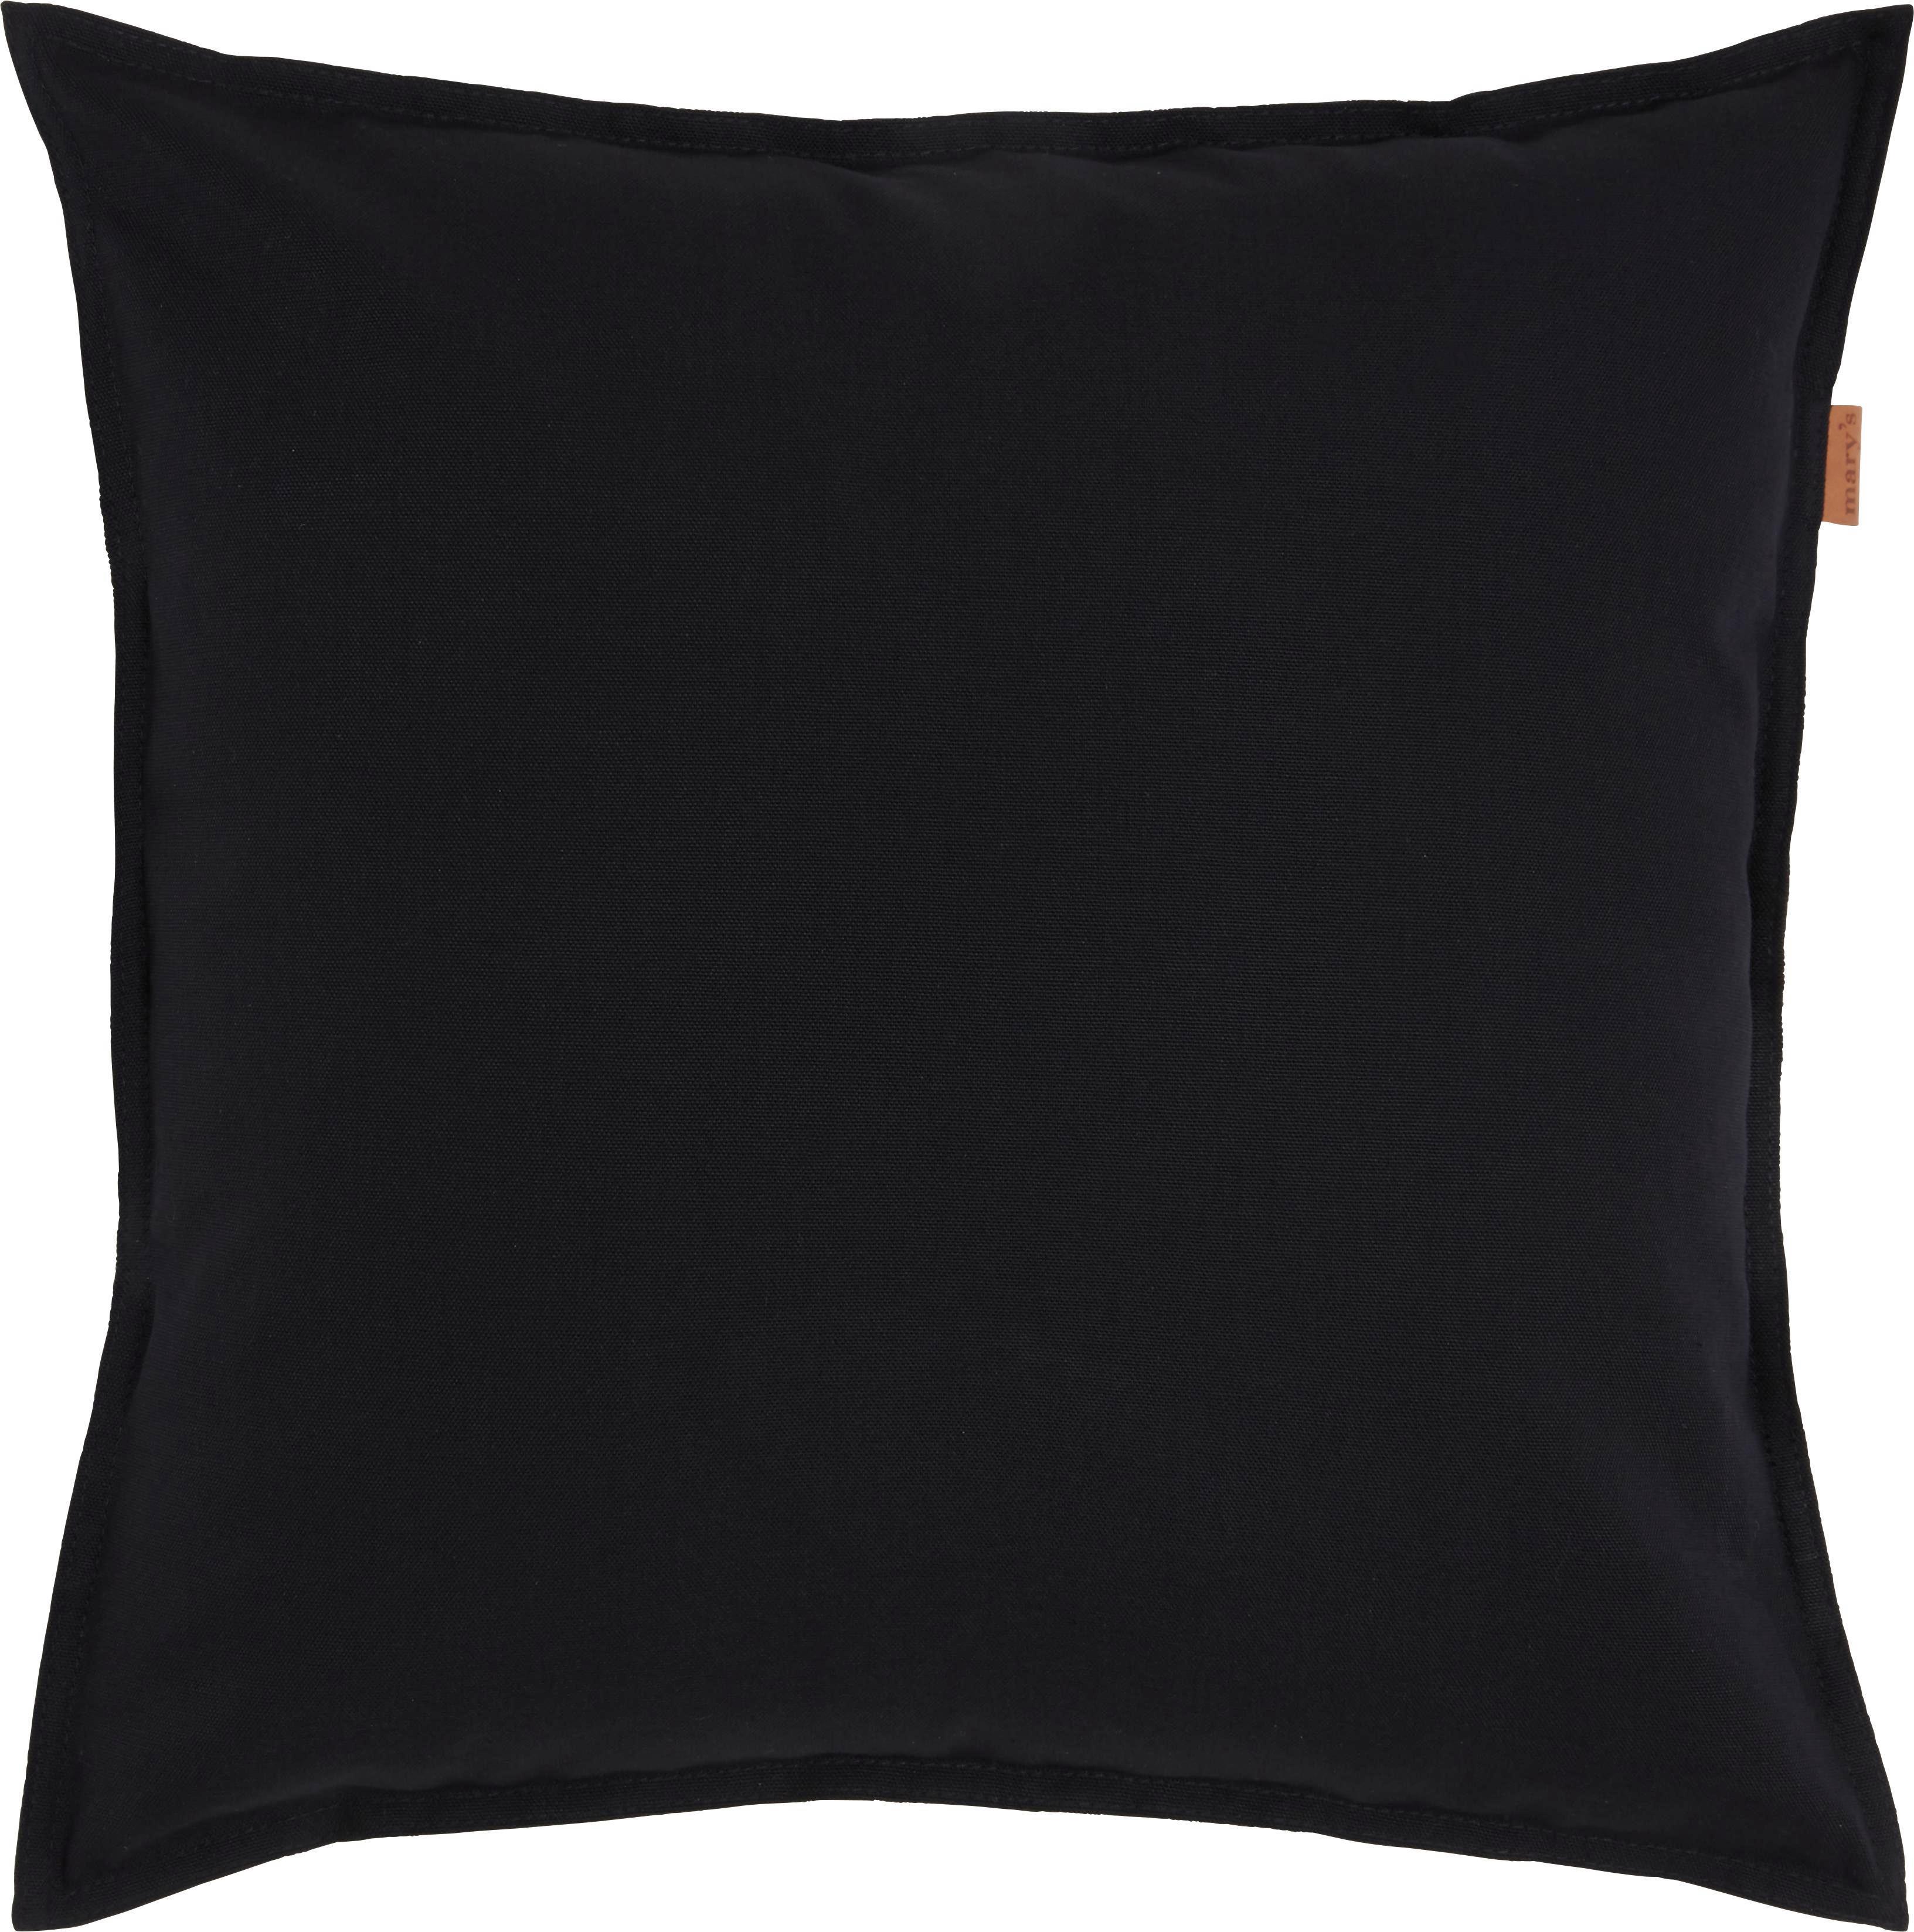 Párnahuzat Jenny Panama - fekete, modern, textil (45/45cm)